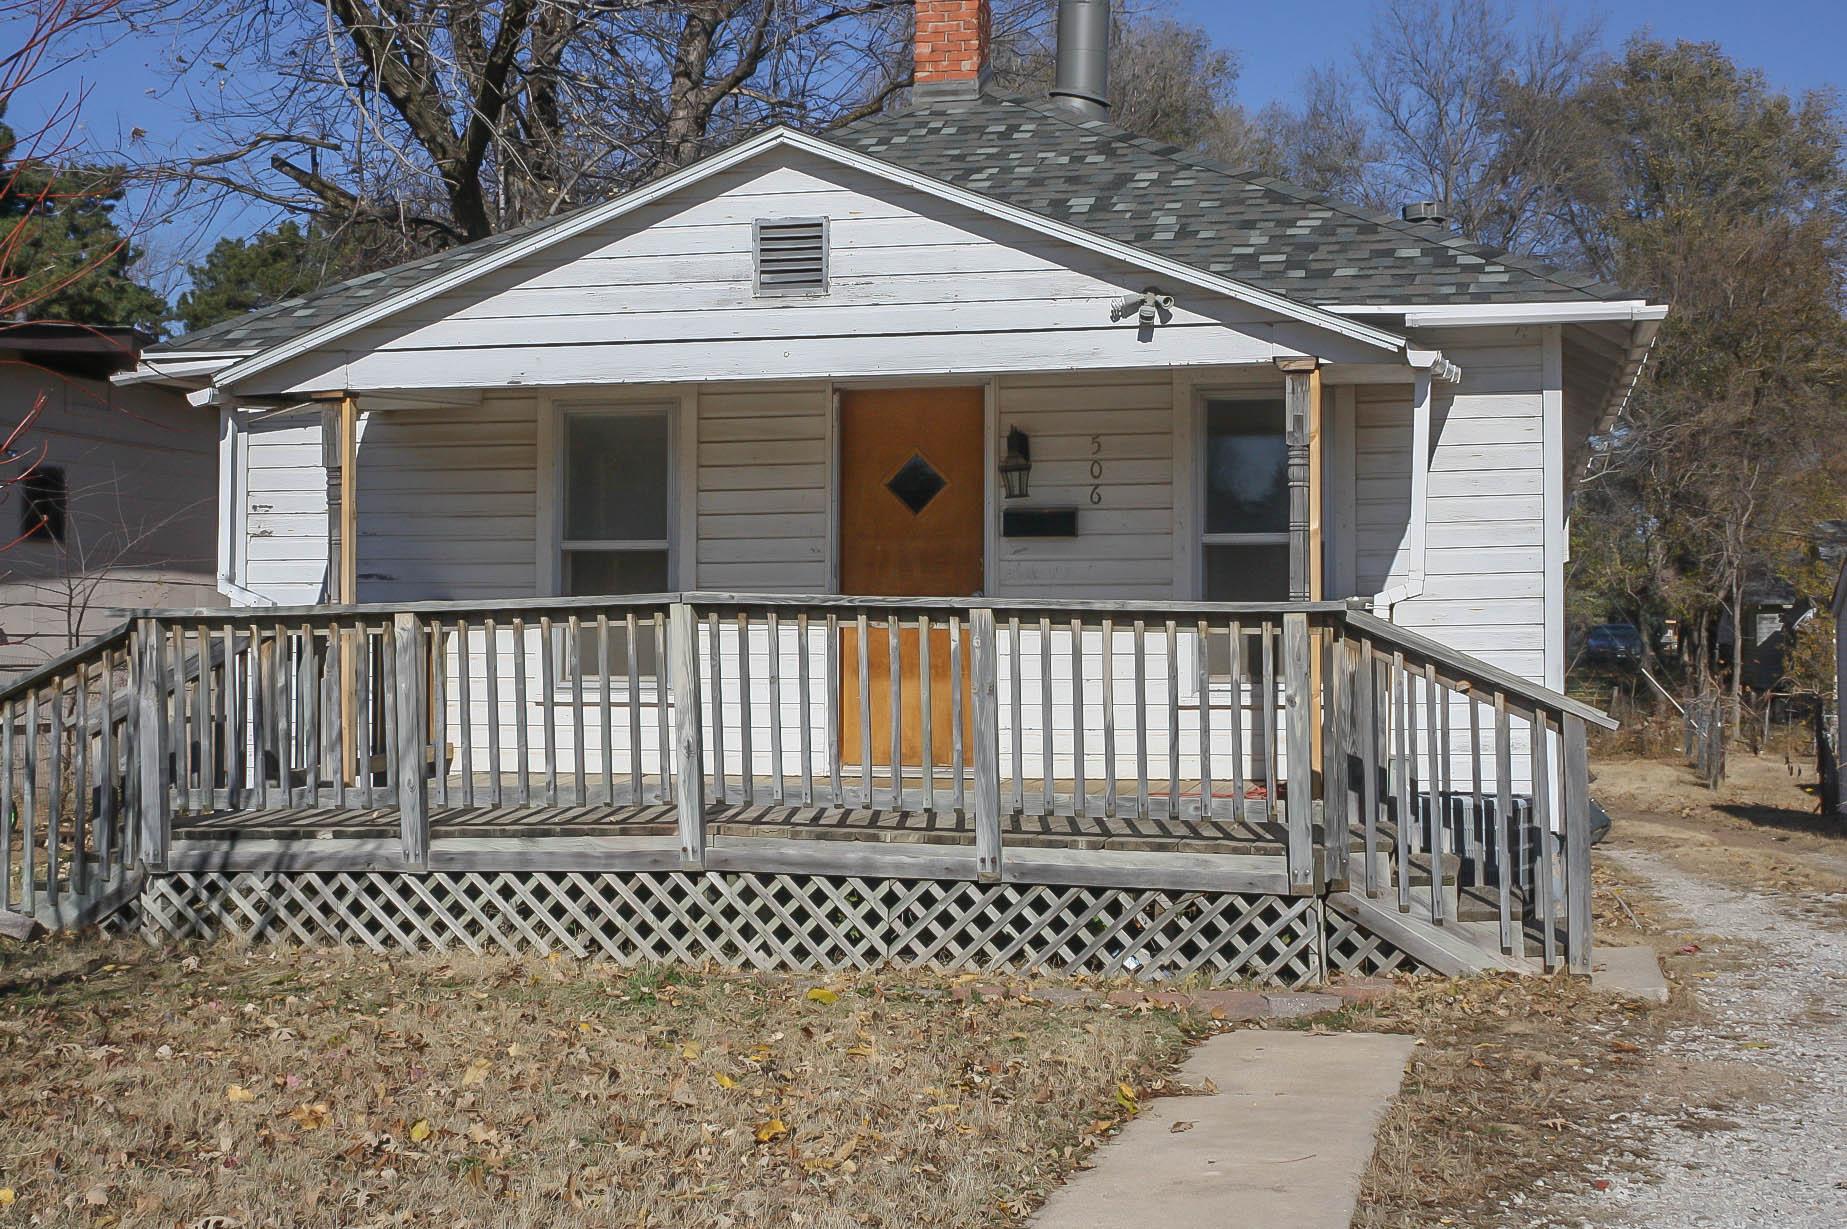 506 W 5th, Pratt, Kansas 67124